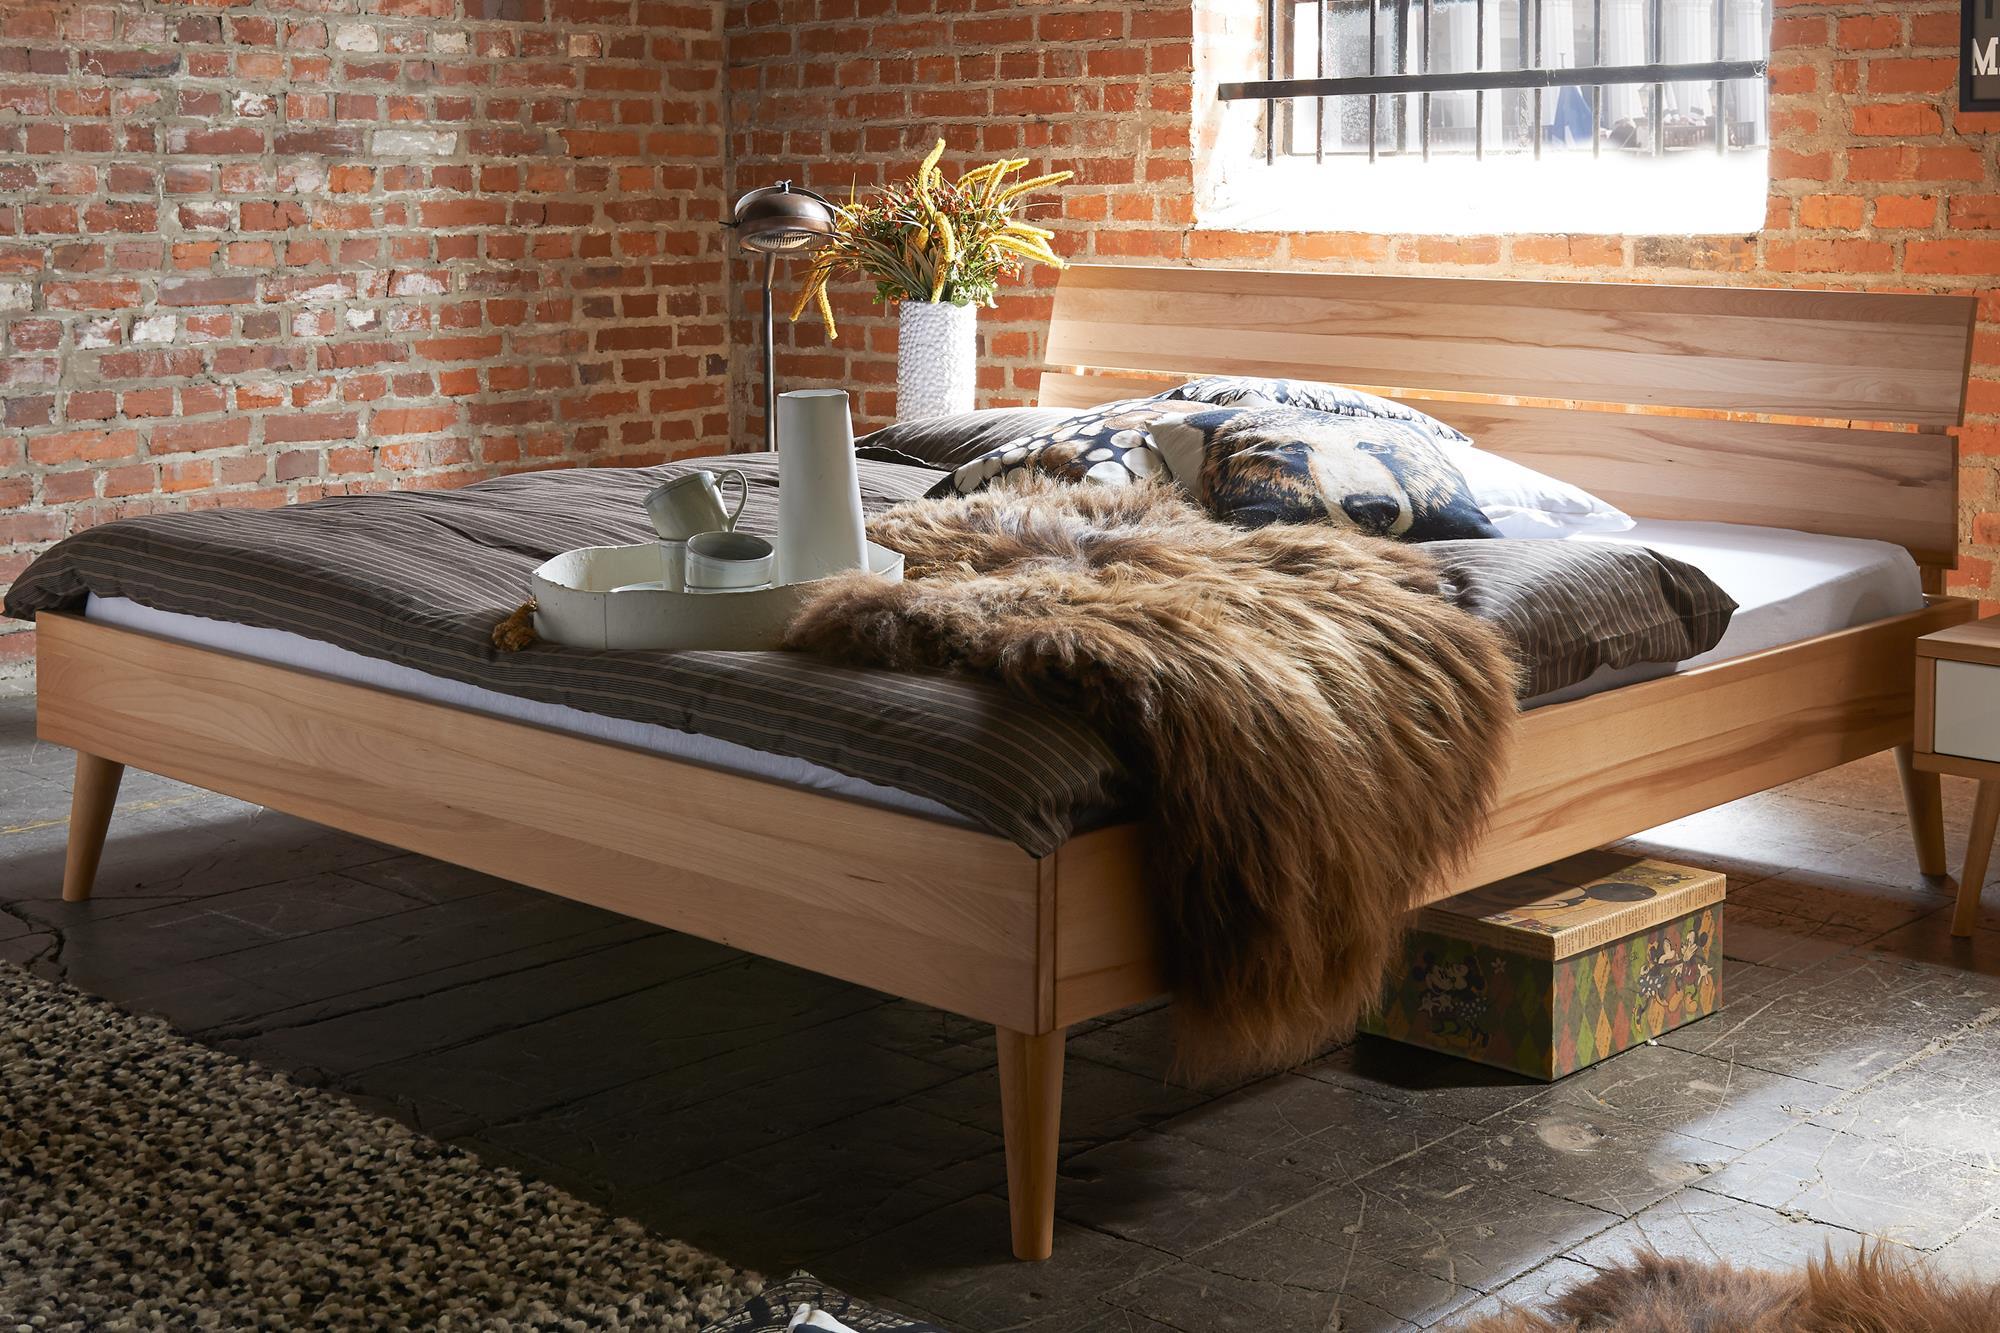 Full Size of Bett Modern Leader Design Betten Holz 180x200 Beyond Better Sleep Pillow 140x200 120x200 Kaufen Eiche Italienisches Puristisch Tjoernbo Konfigurator Wohnzimmer Wohnzimmer Bett Modern